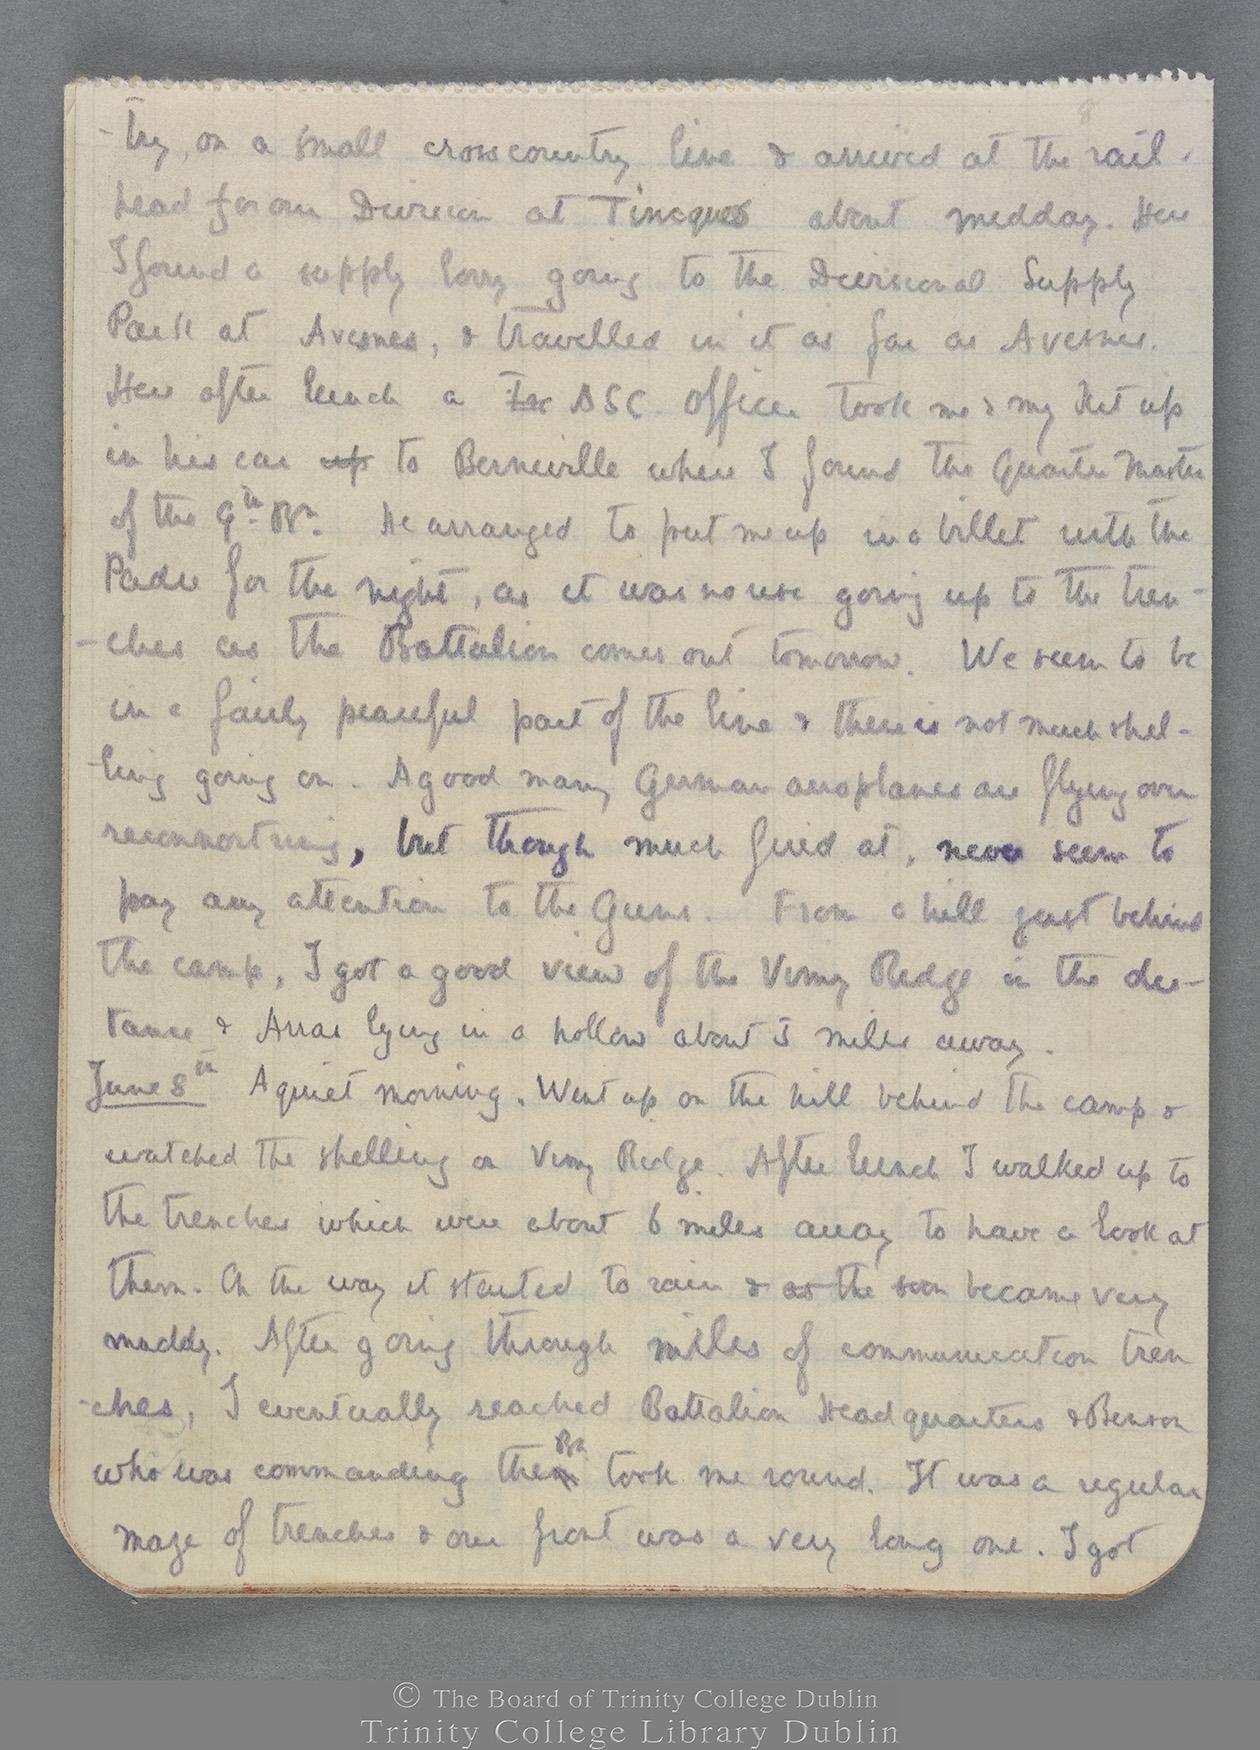 TCD MS 10821 folio 8 recto